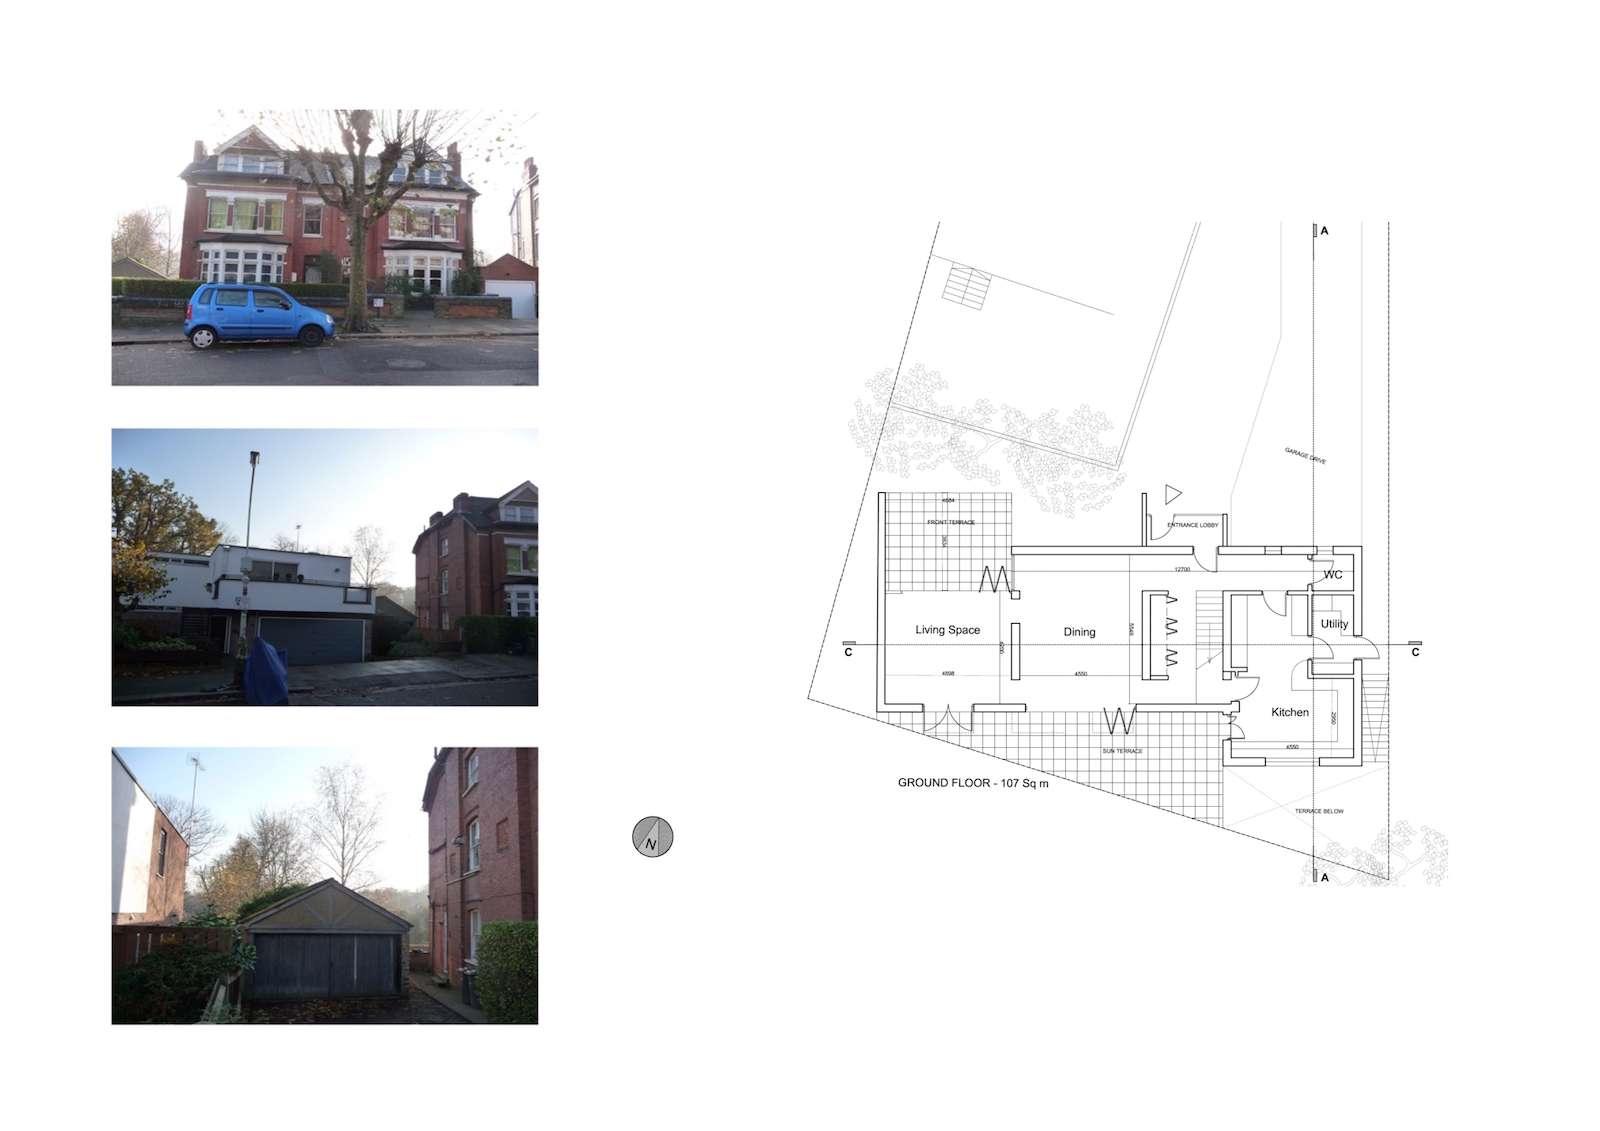 03 Highgate Haringey N6 House development Lower floor plan Highgate I, Haringey N6 | Residential property development